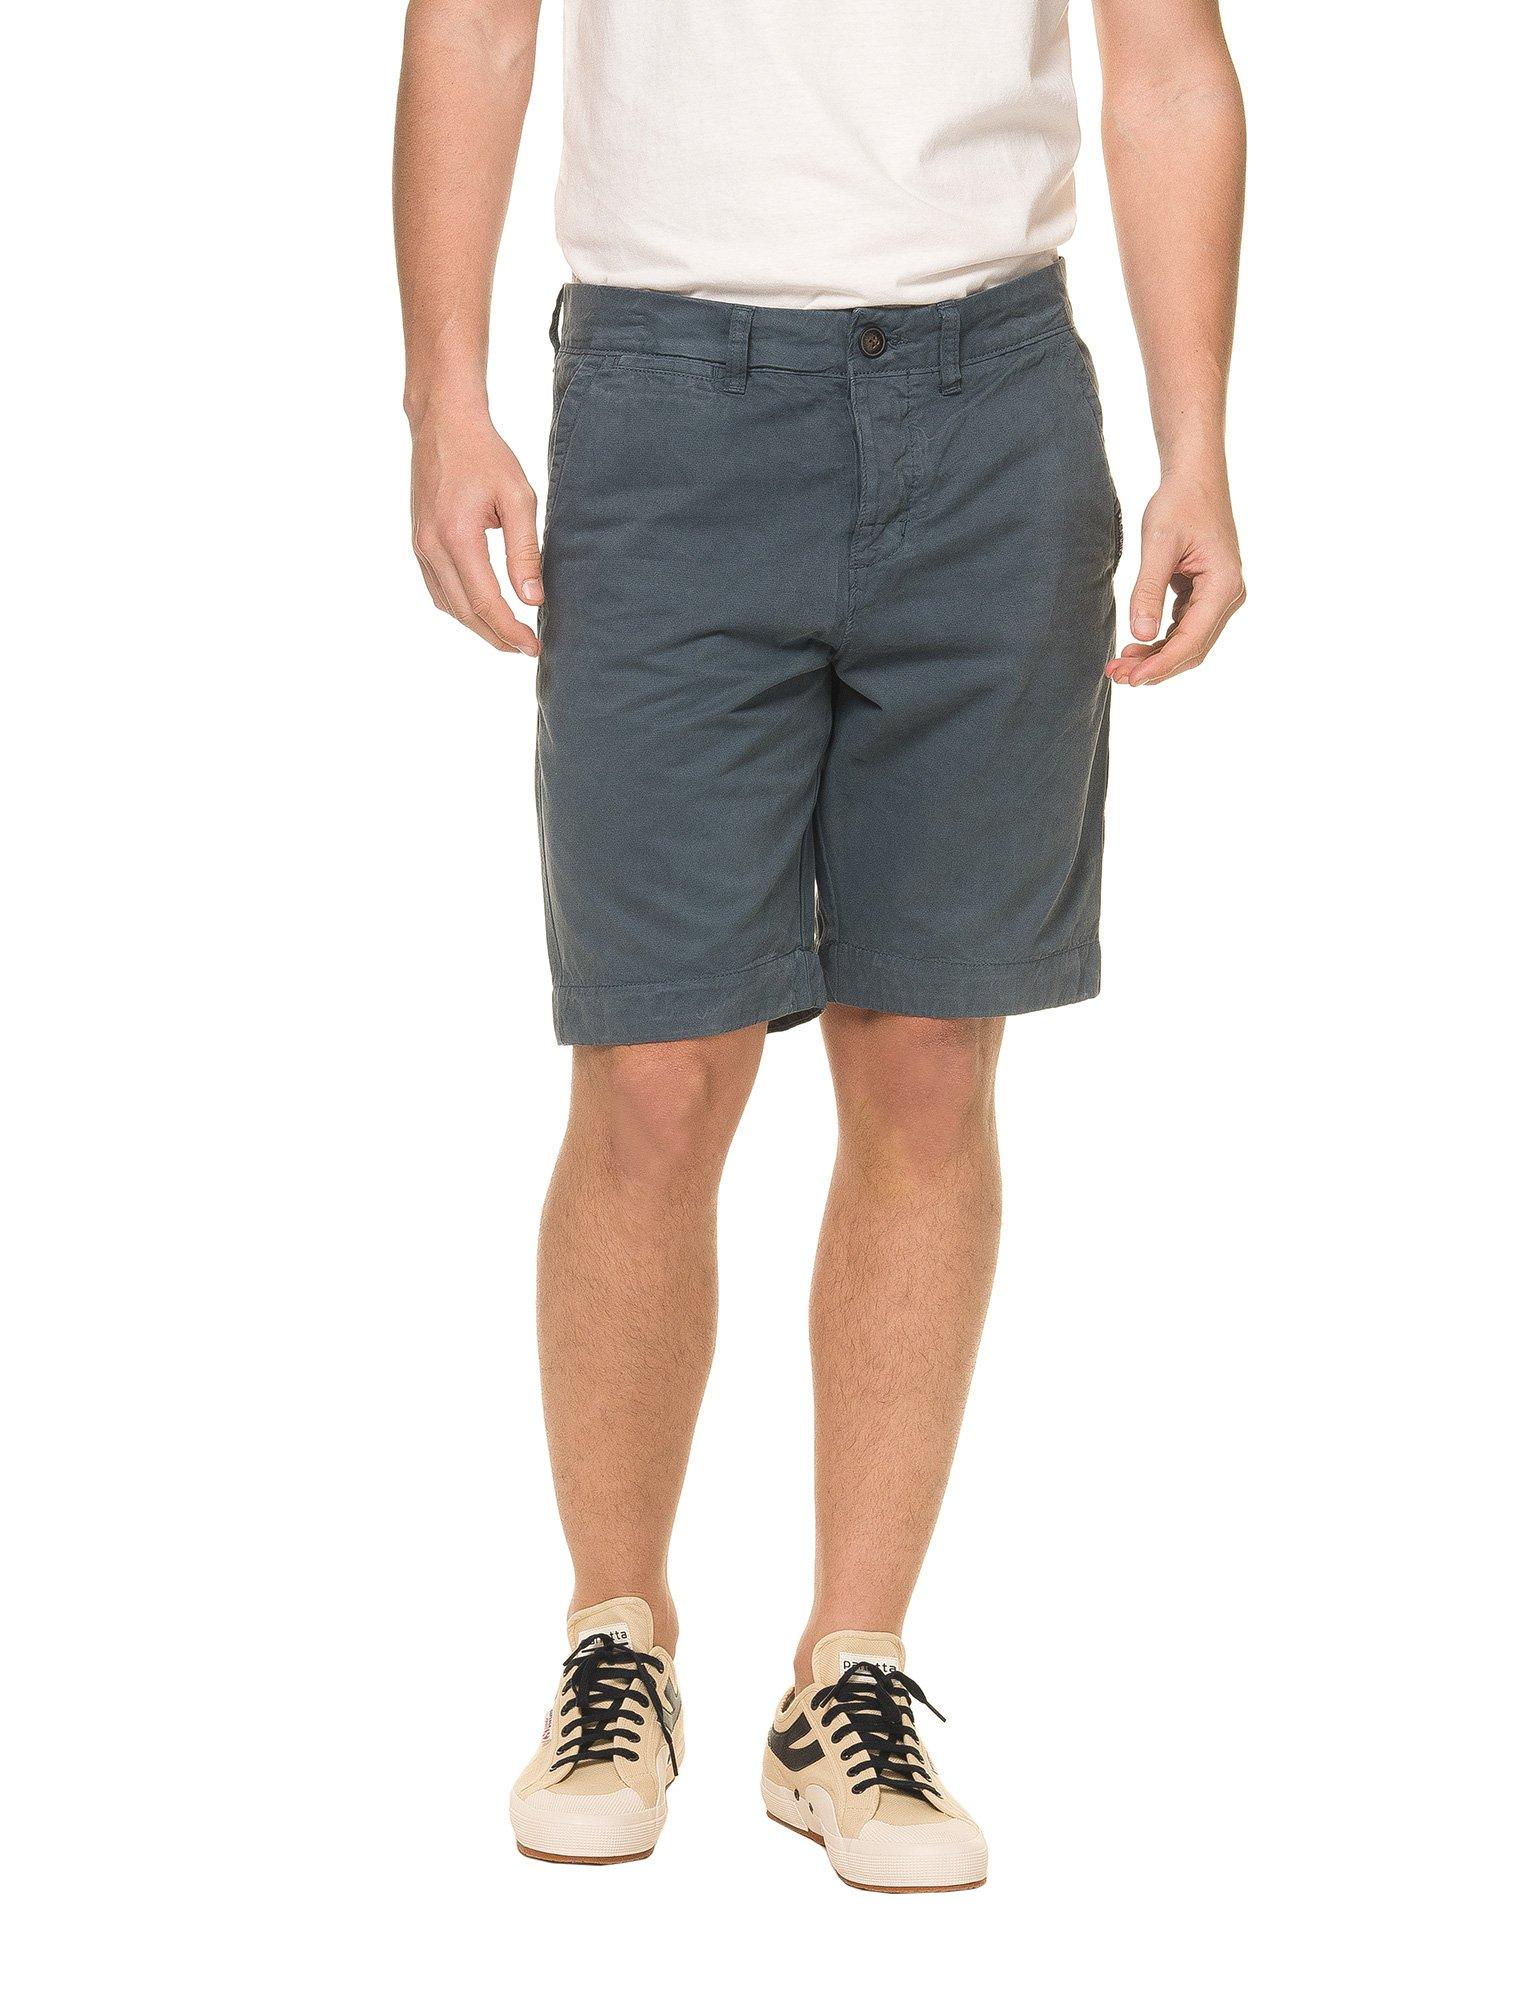 Superdry Men's International Chino Short Men's Blue Shorts in Size M Blue